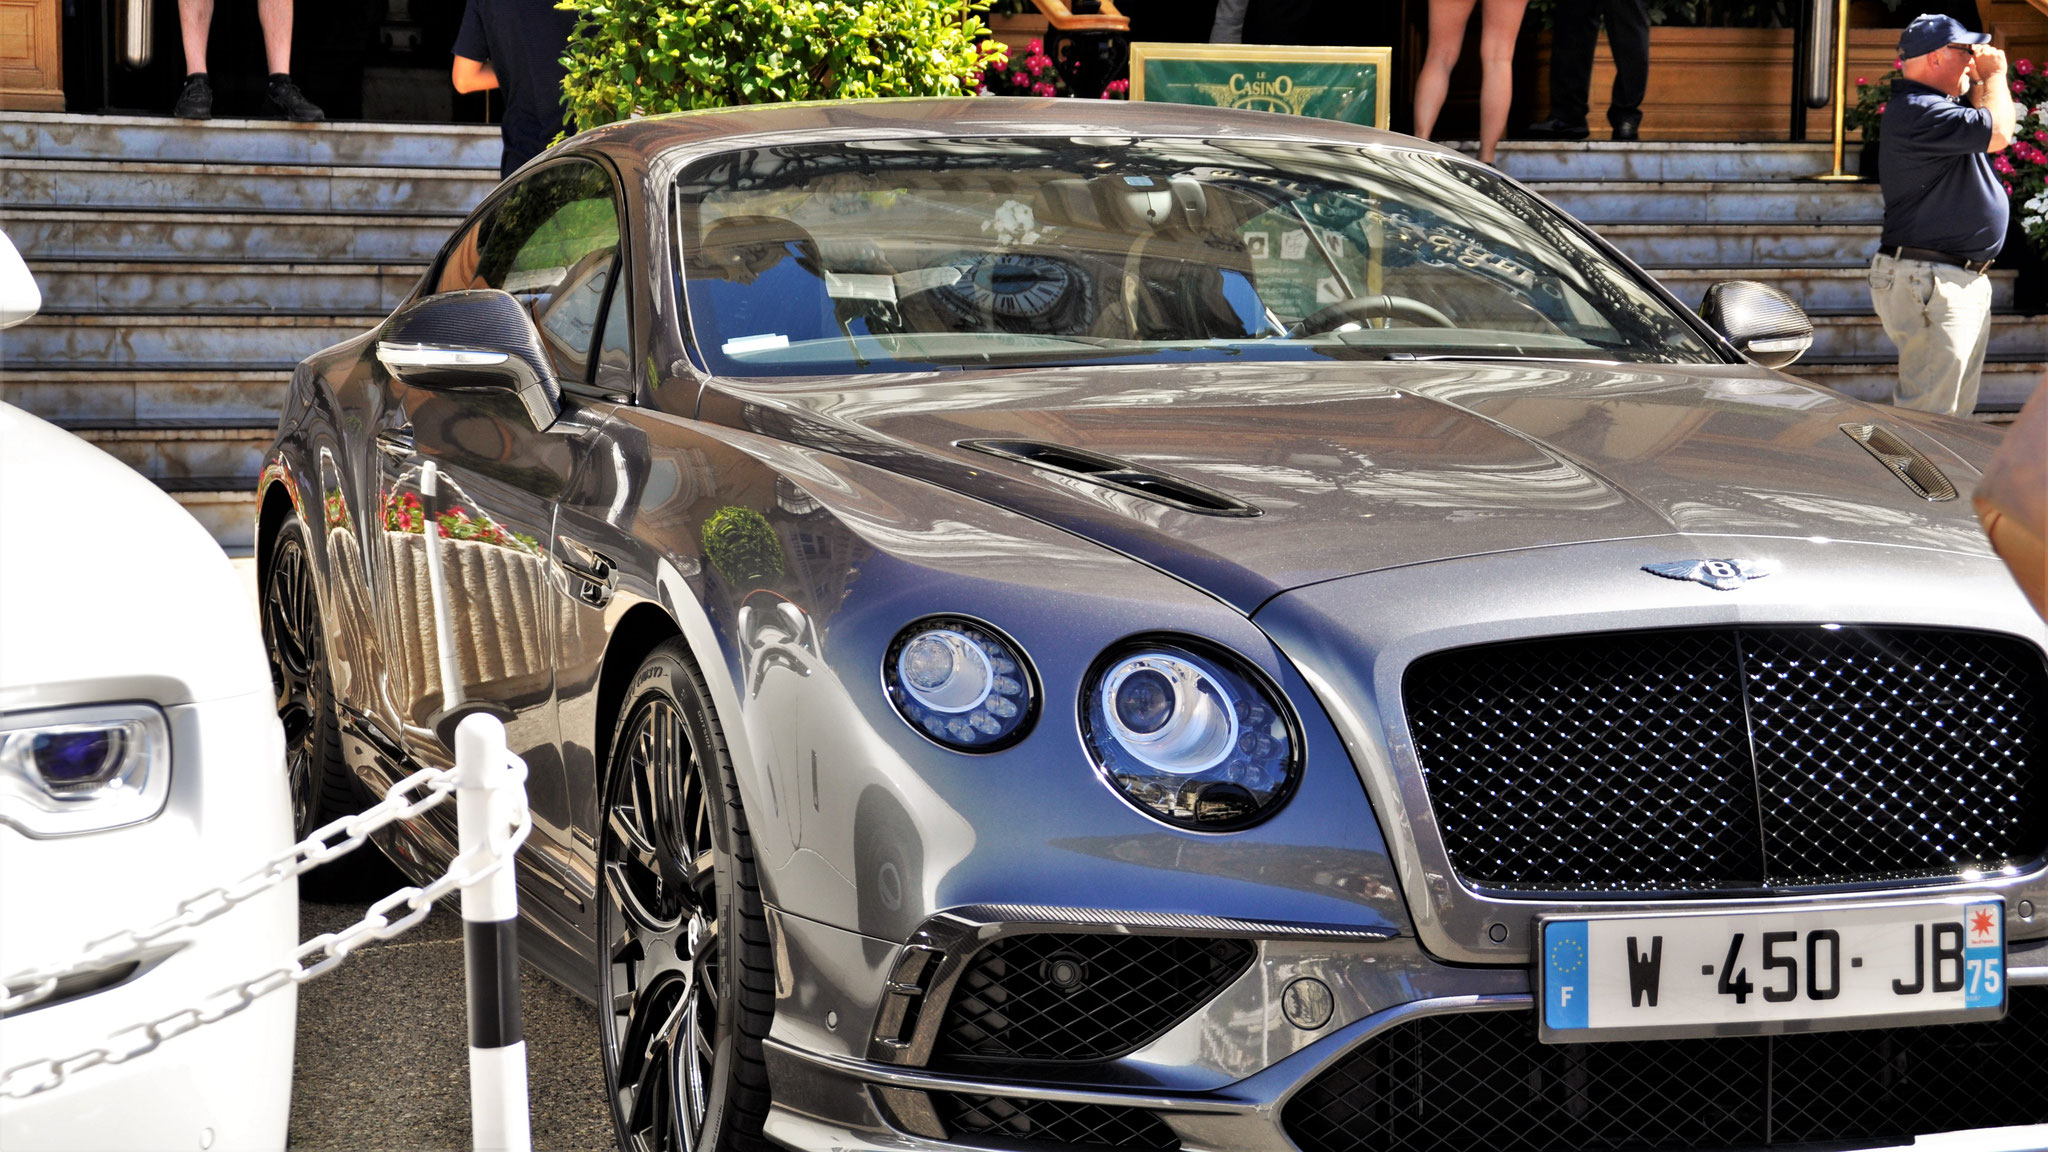 Bentley Continental GT Supersports - W-450-JB-75 (FRA)